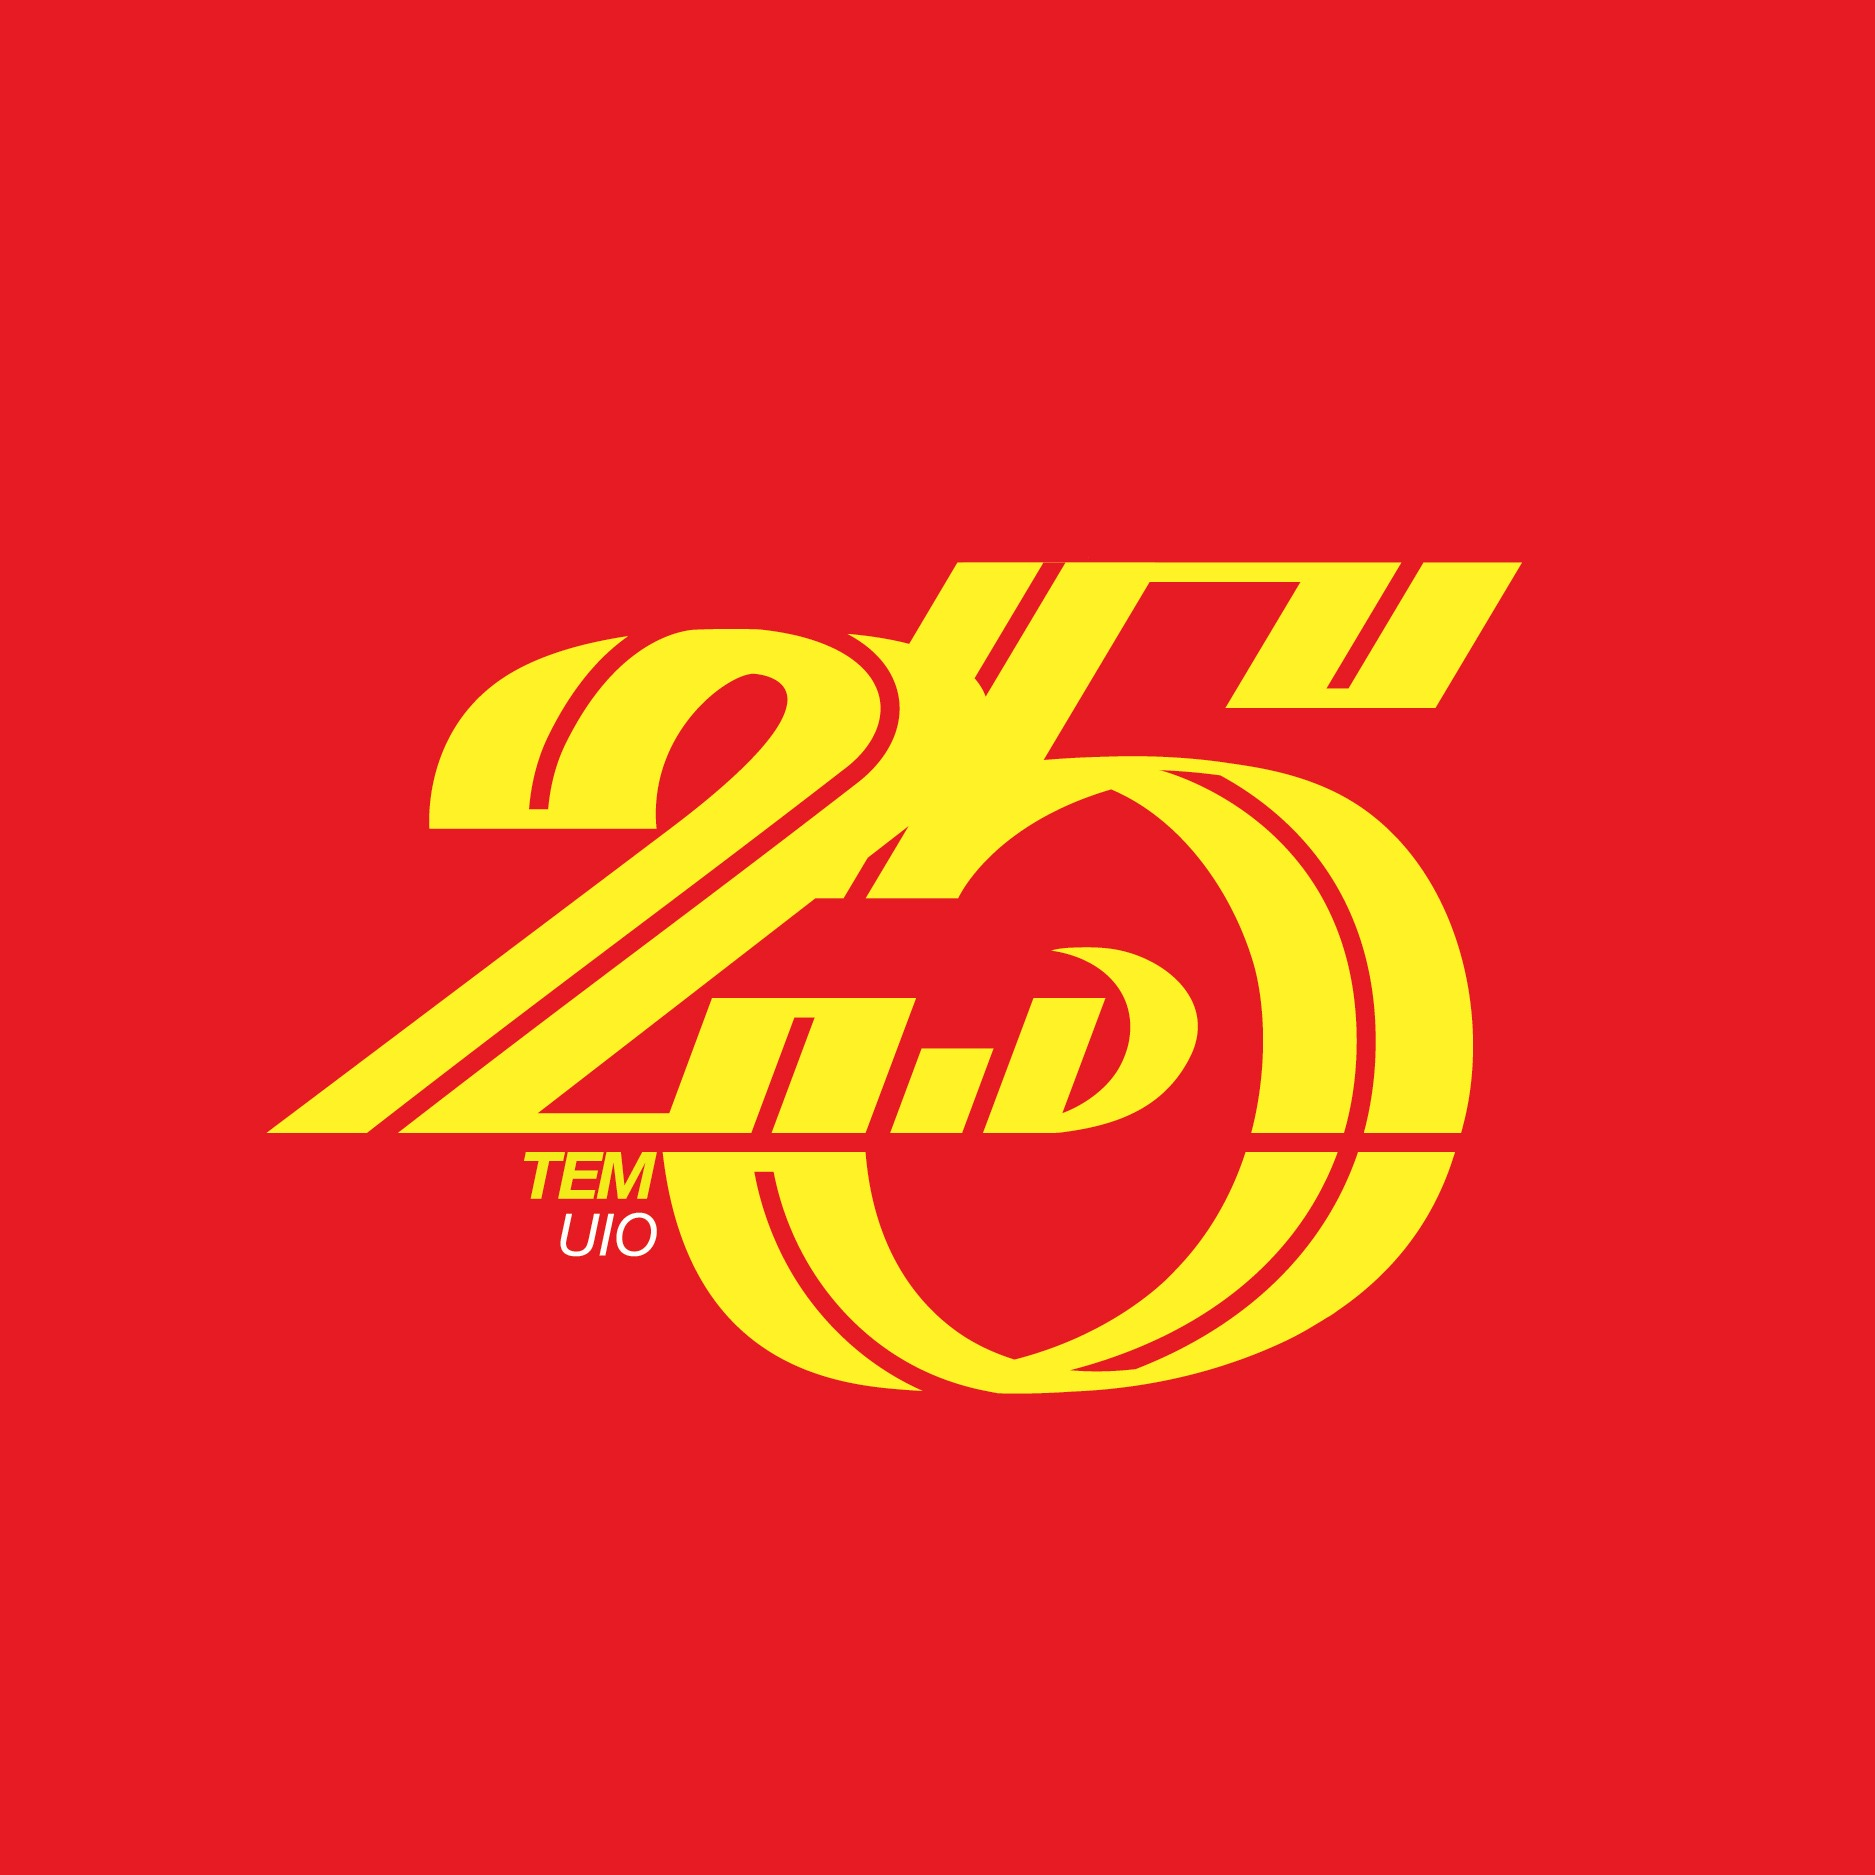 Organizador: 2.5D